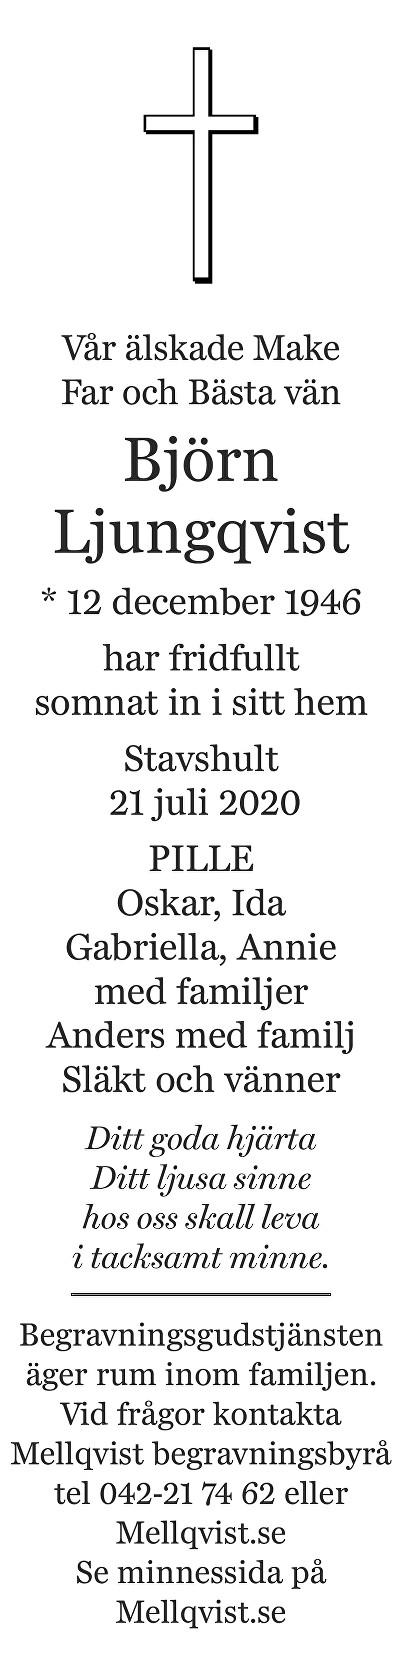 Björn Ljungqvist Death notice